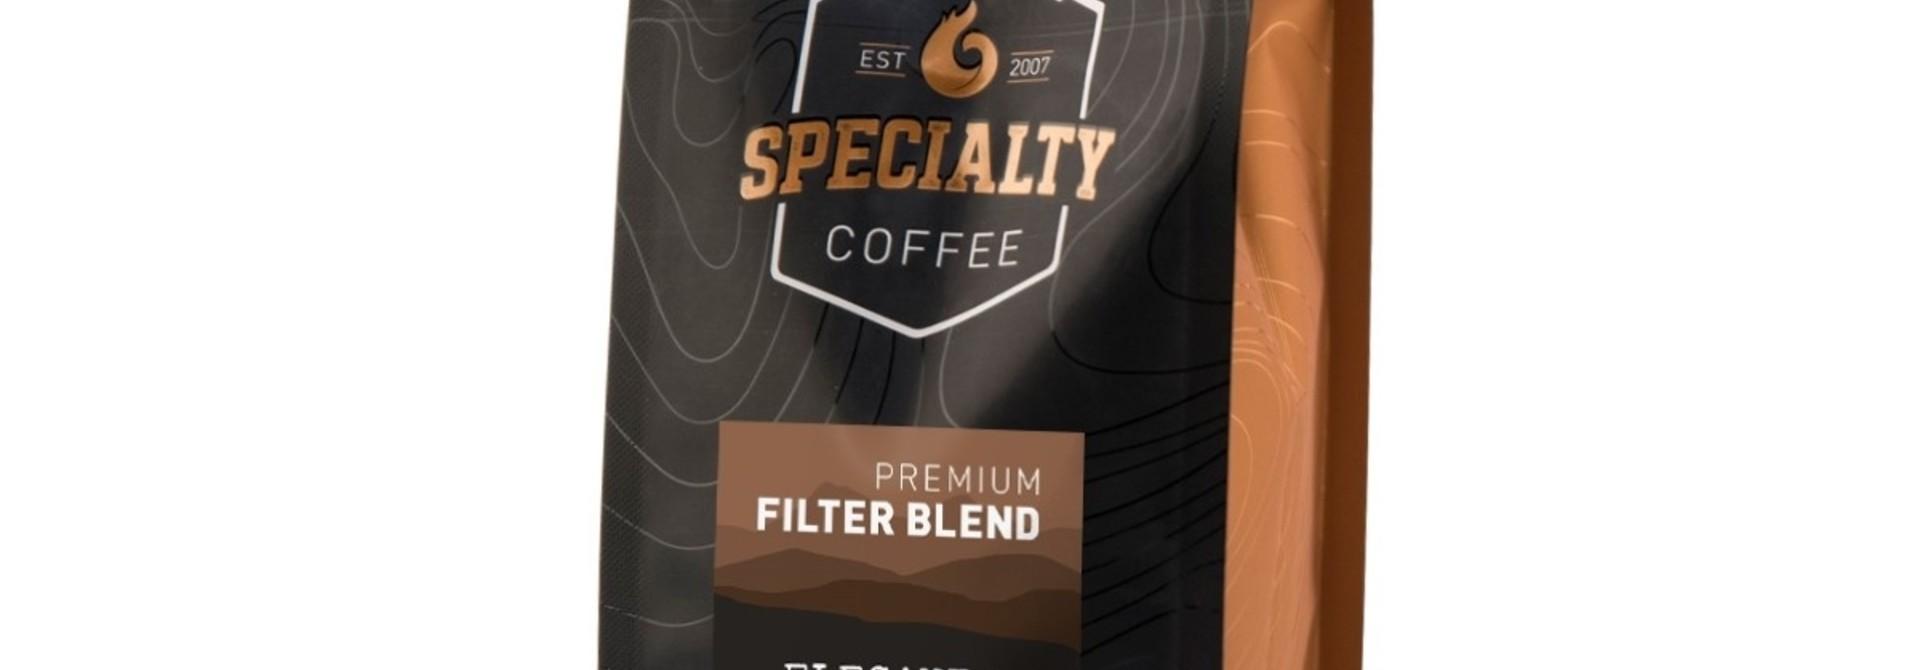 Premium Filter Blend 250g